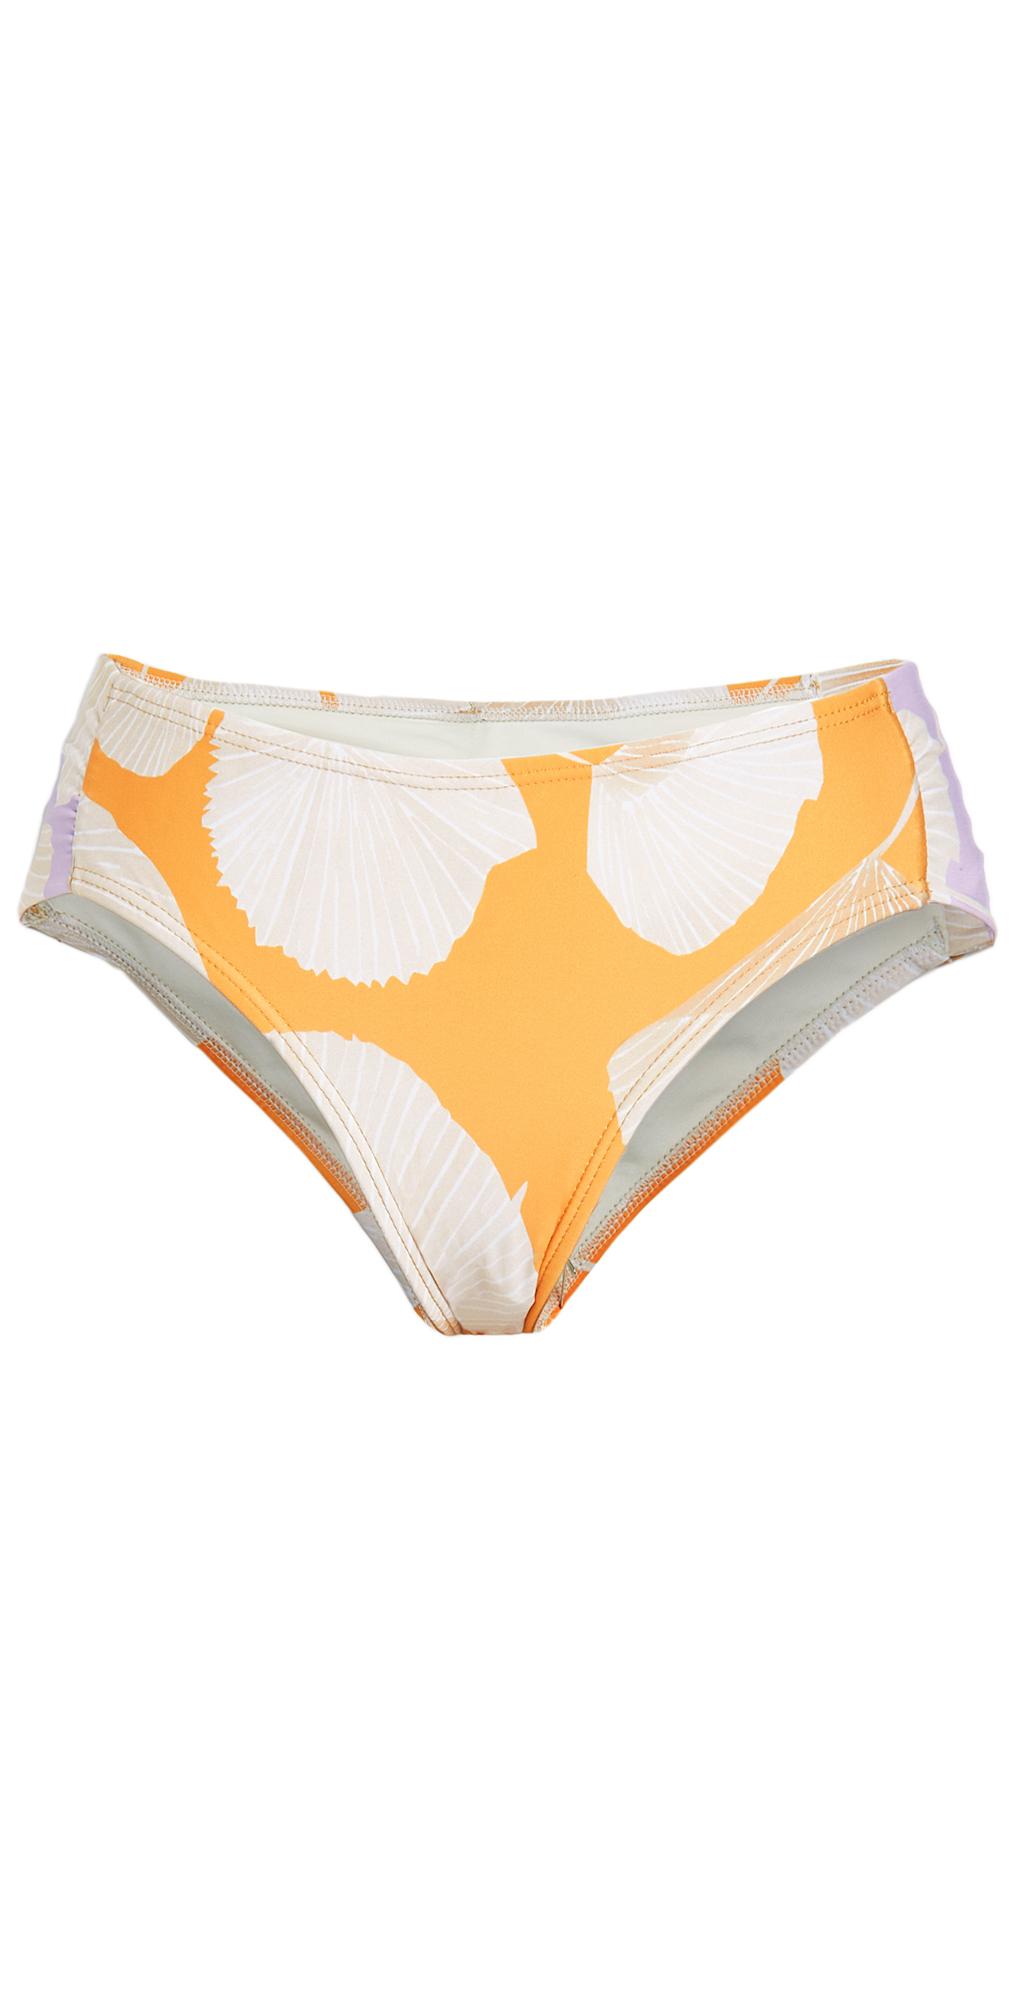 Palmacea Loto 22 Bikini Bottoms